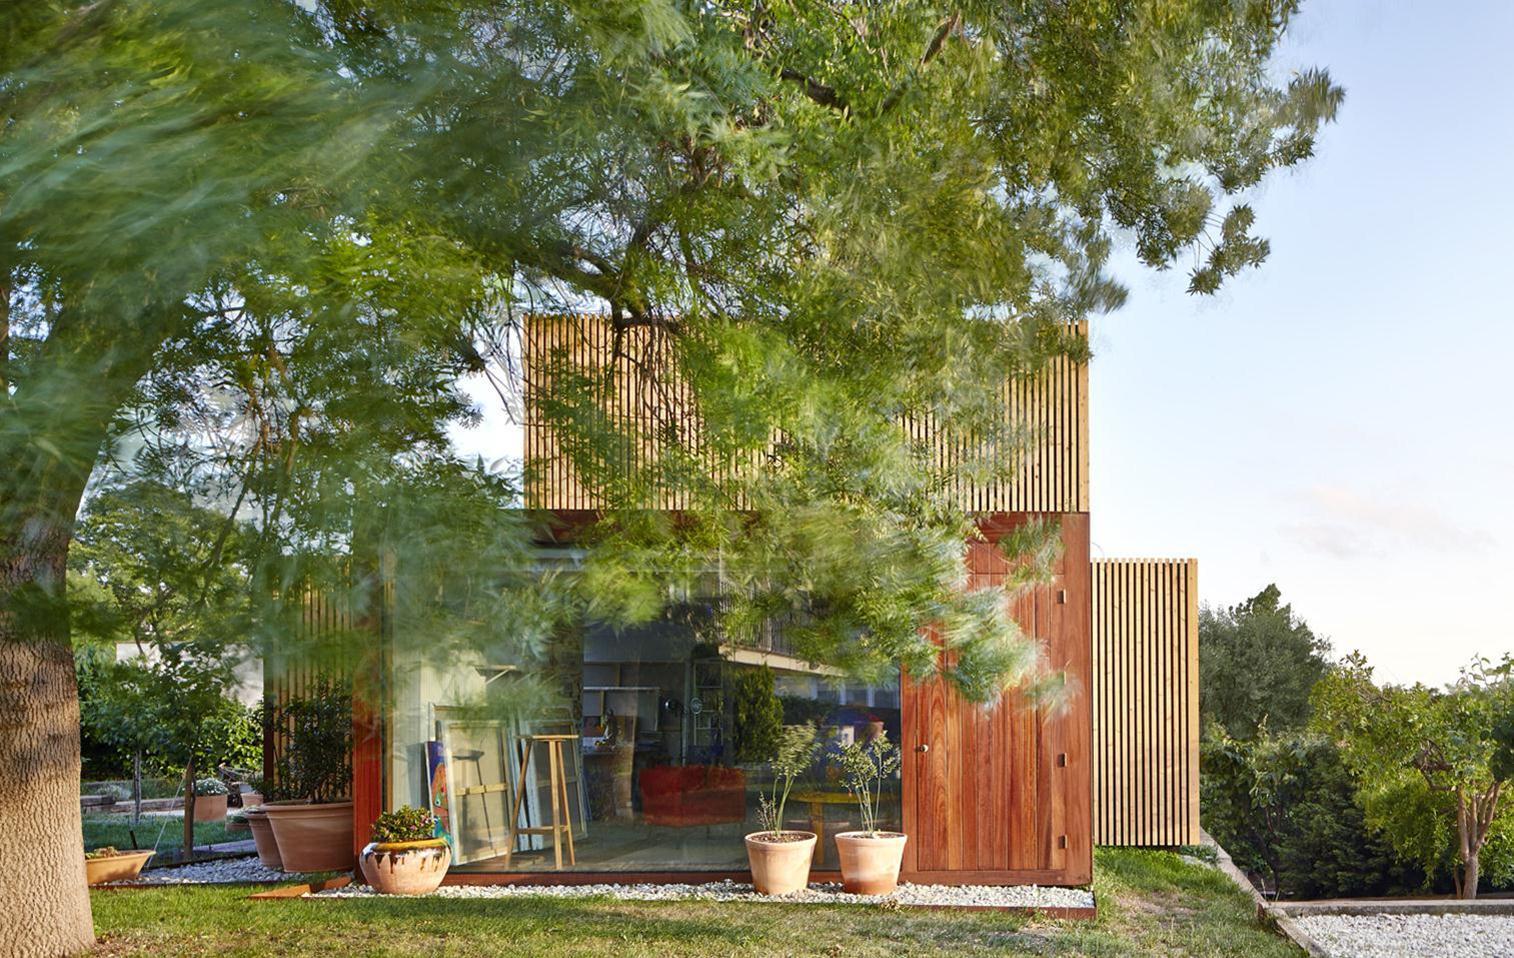 Artist's Studio / Josep Camps - Olga Felip (12)